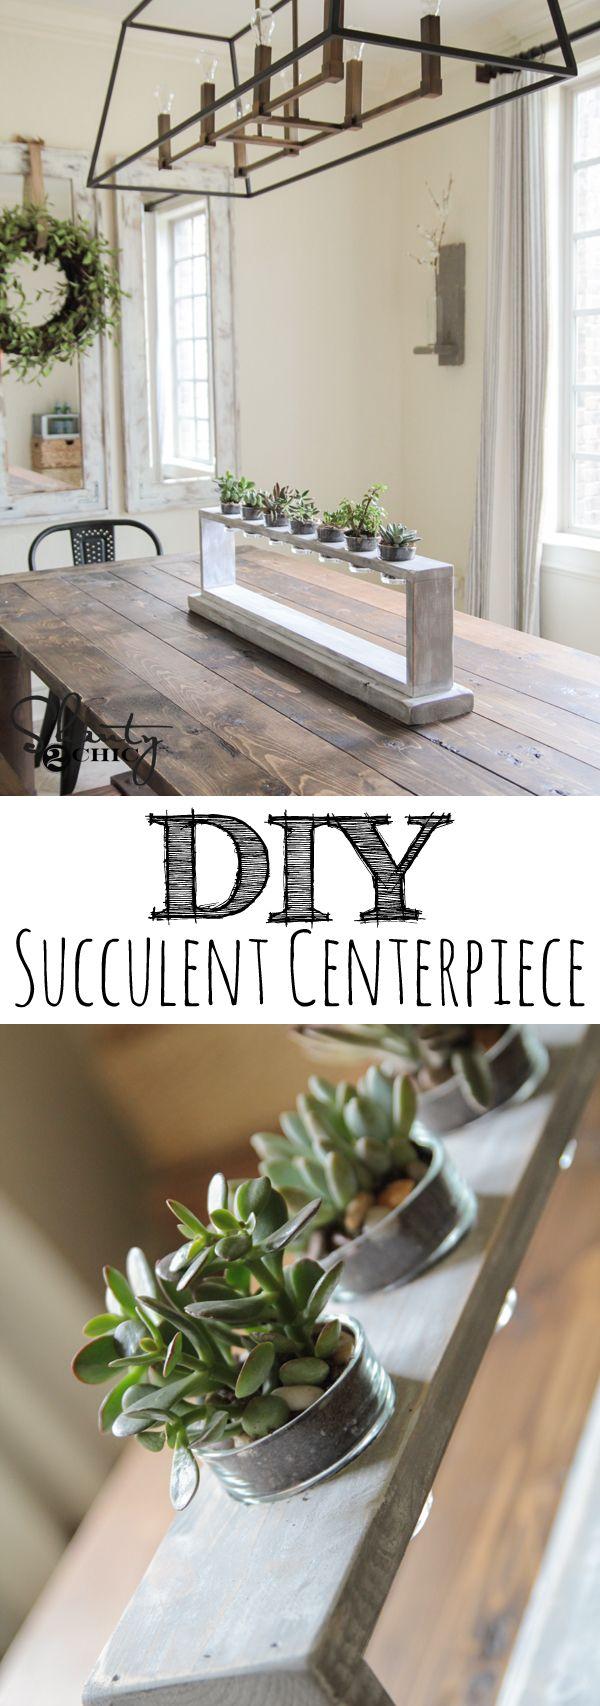 DIY Succulent Centerpiece Tutorial... So cute and easy! www.shanty-2-chic.com